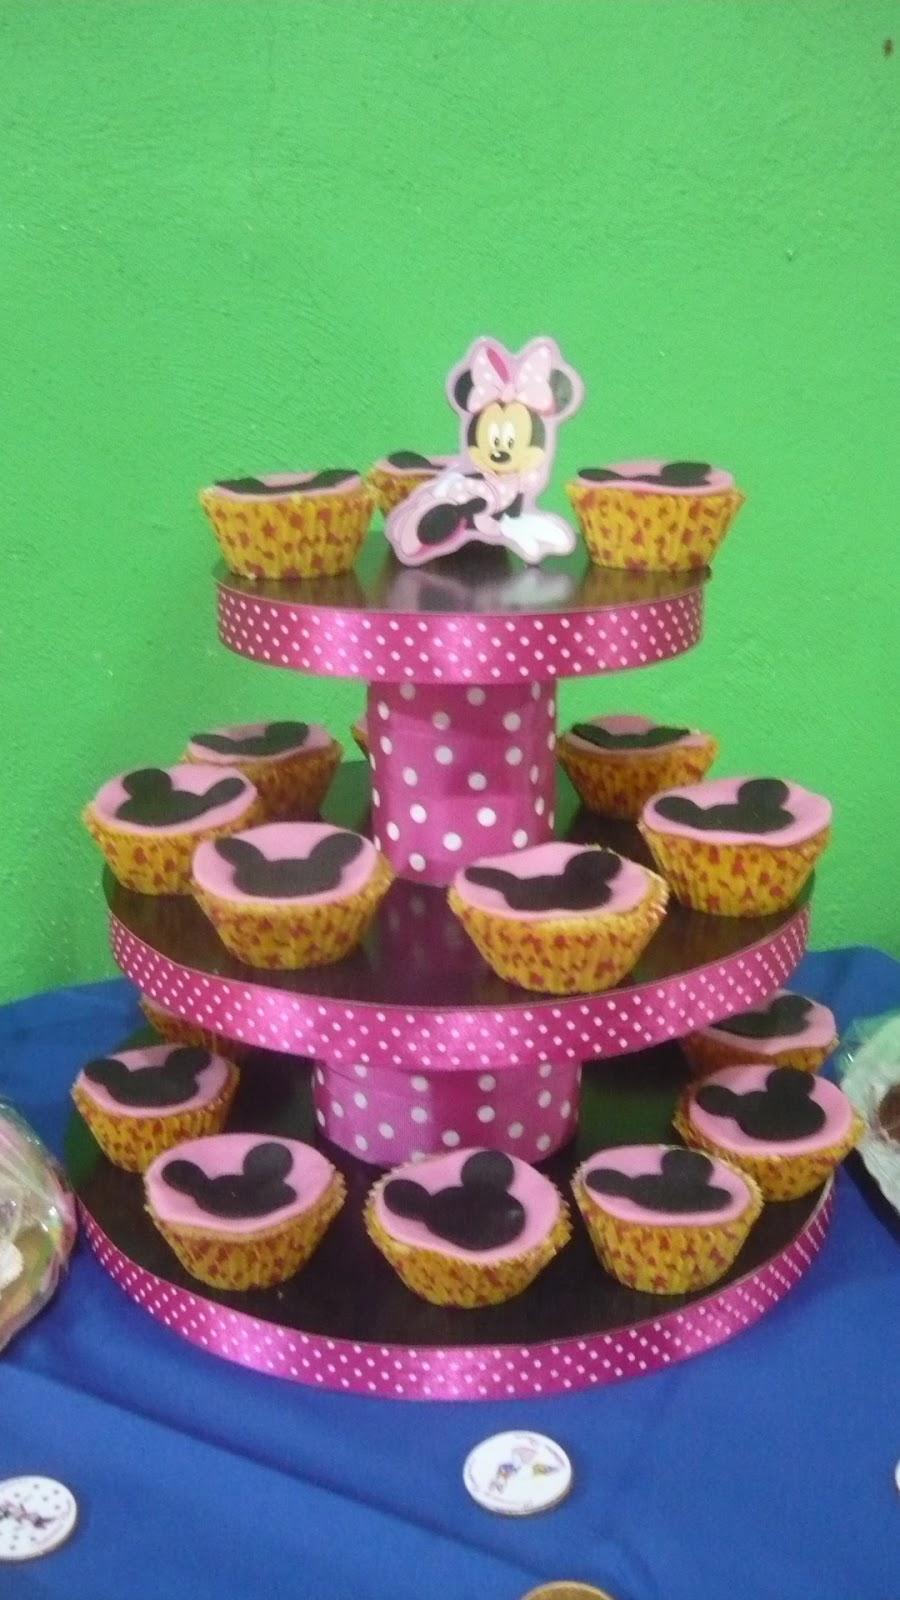 D'koEventos: Cumpleaños Infantil de la Casa de Mickey Mouse